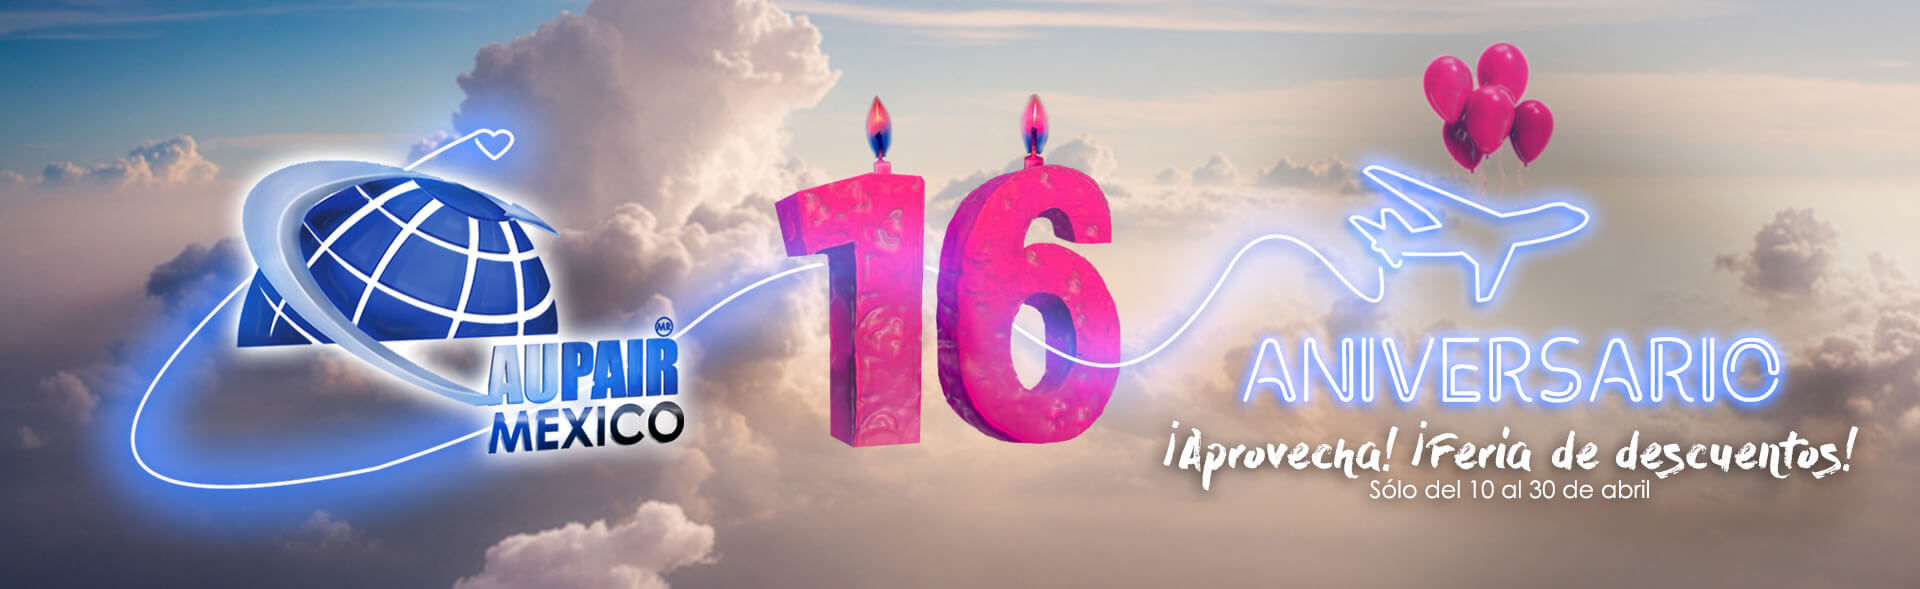 Au Pair Mexico 16 Aniversario